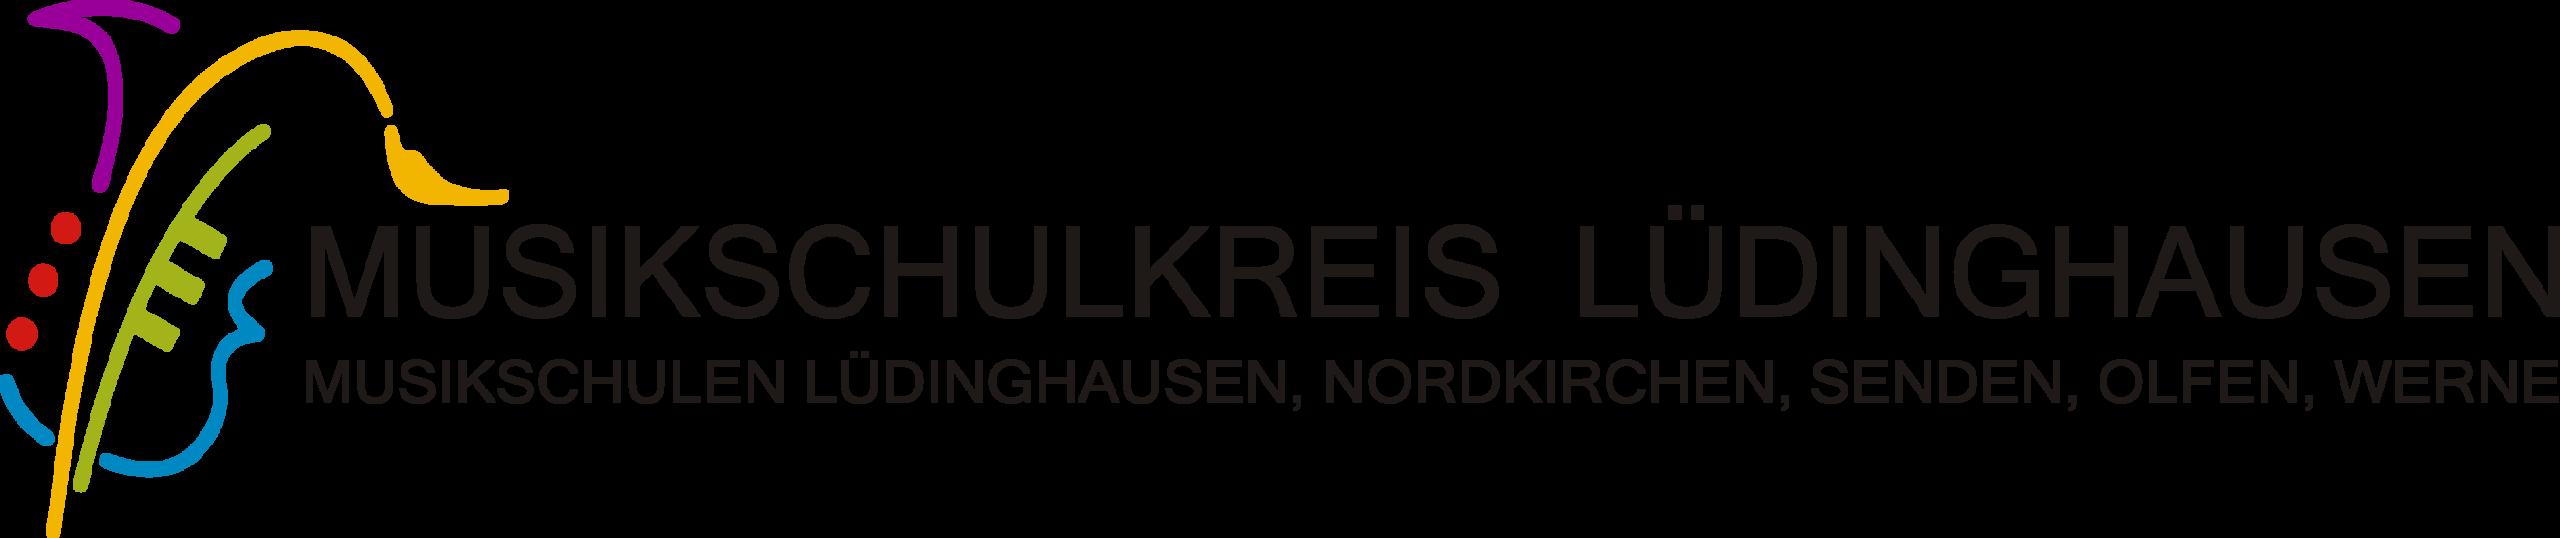 Musikschulkreis Lüdinghausen